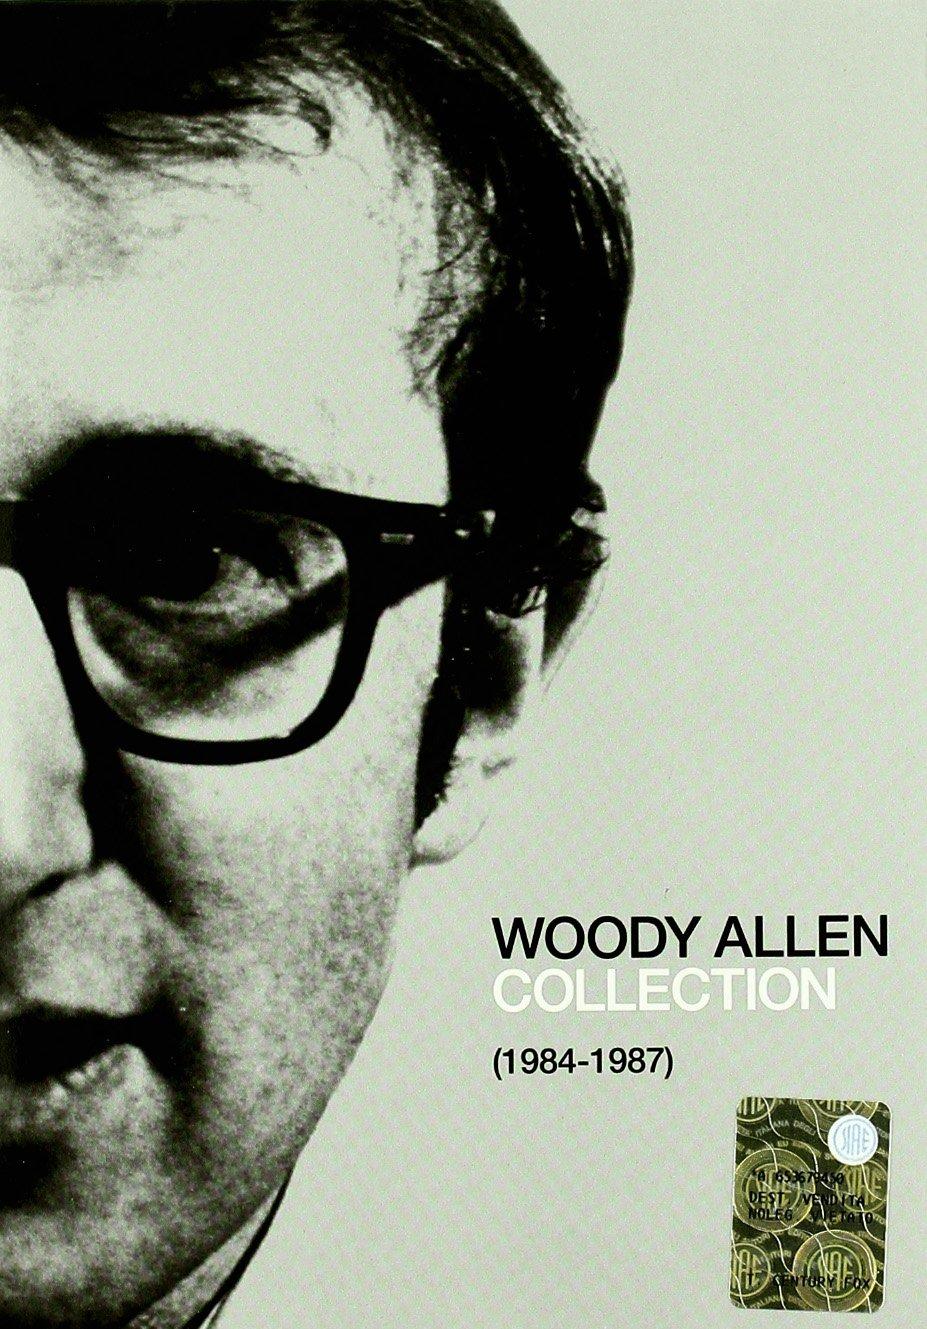 Woody Allen Collection 03 - 1984-1987 5 Dvd Italia: Amazon.es ...